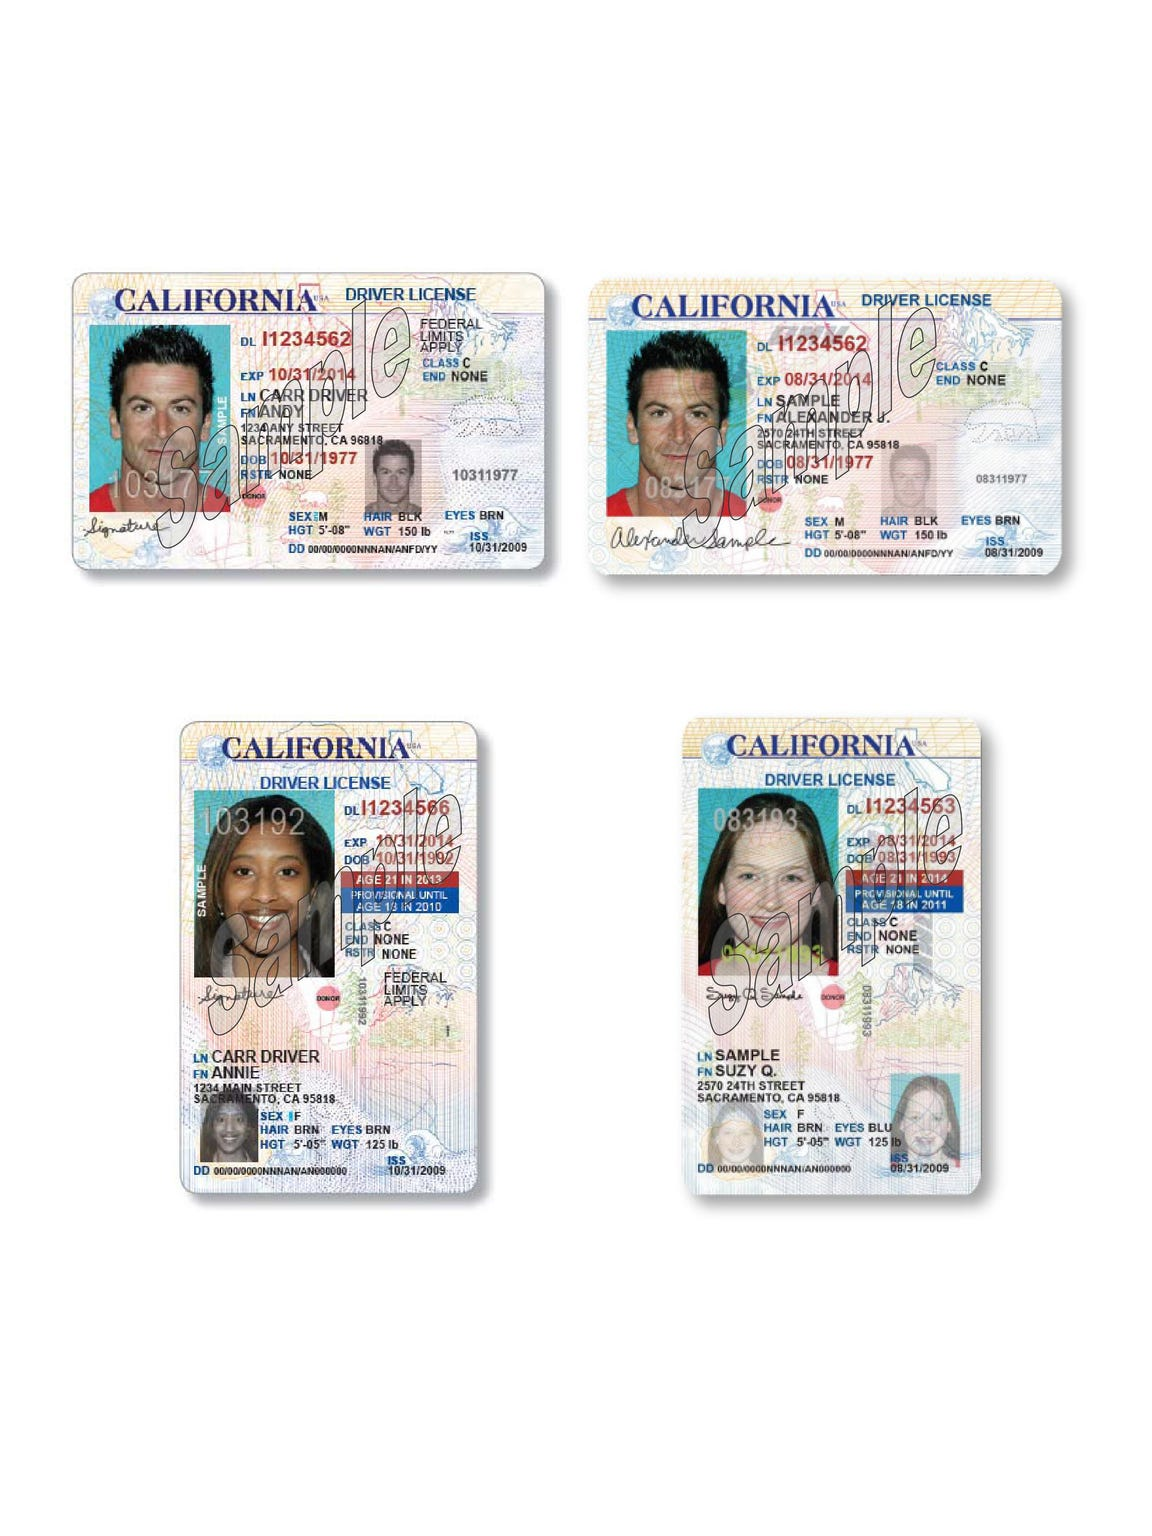 DMV comparison.jpg